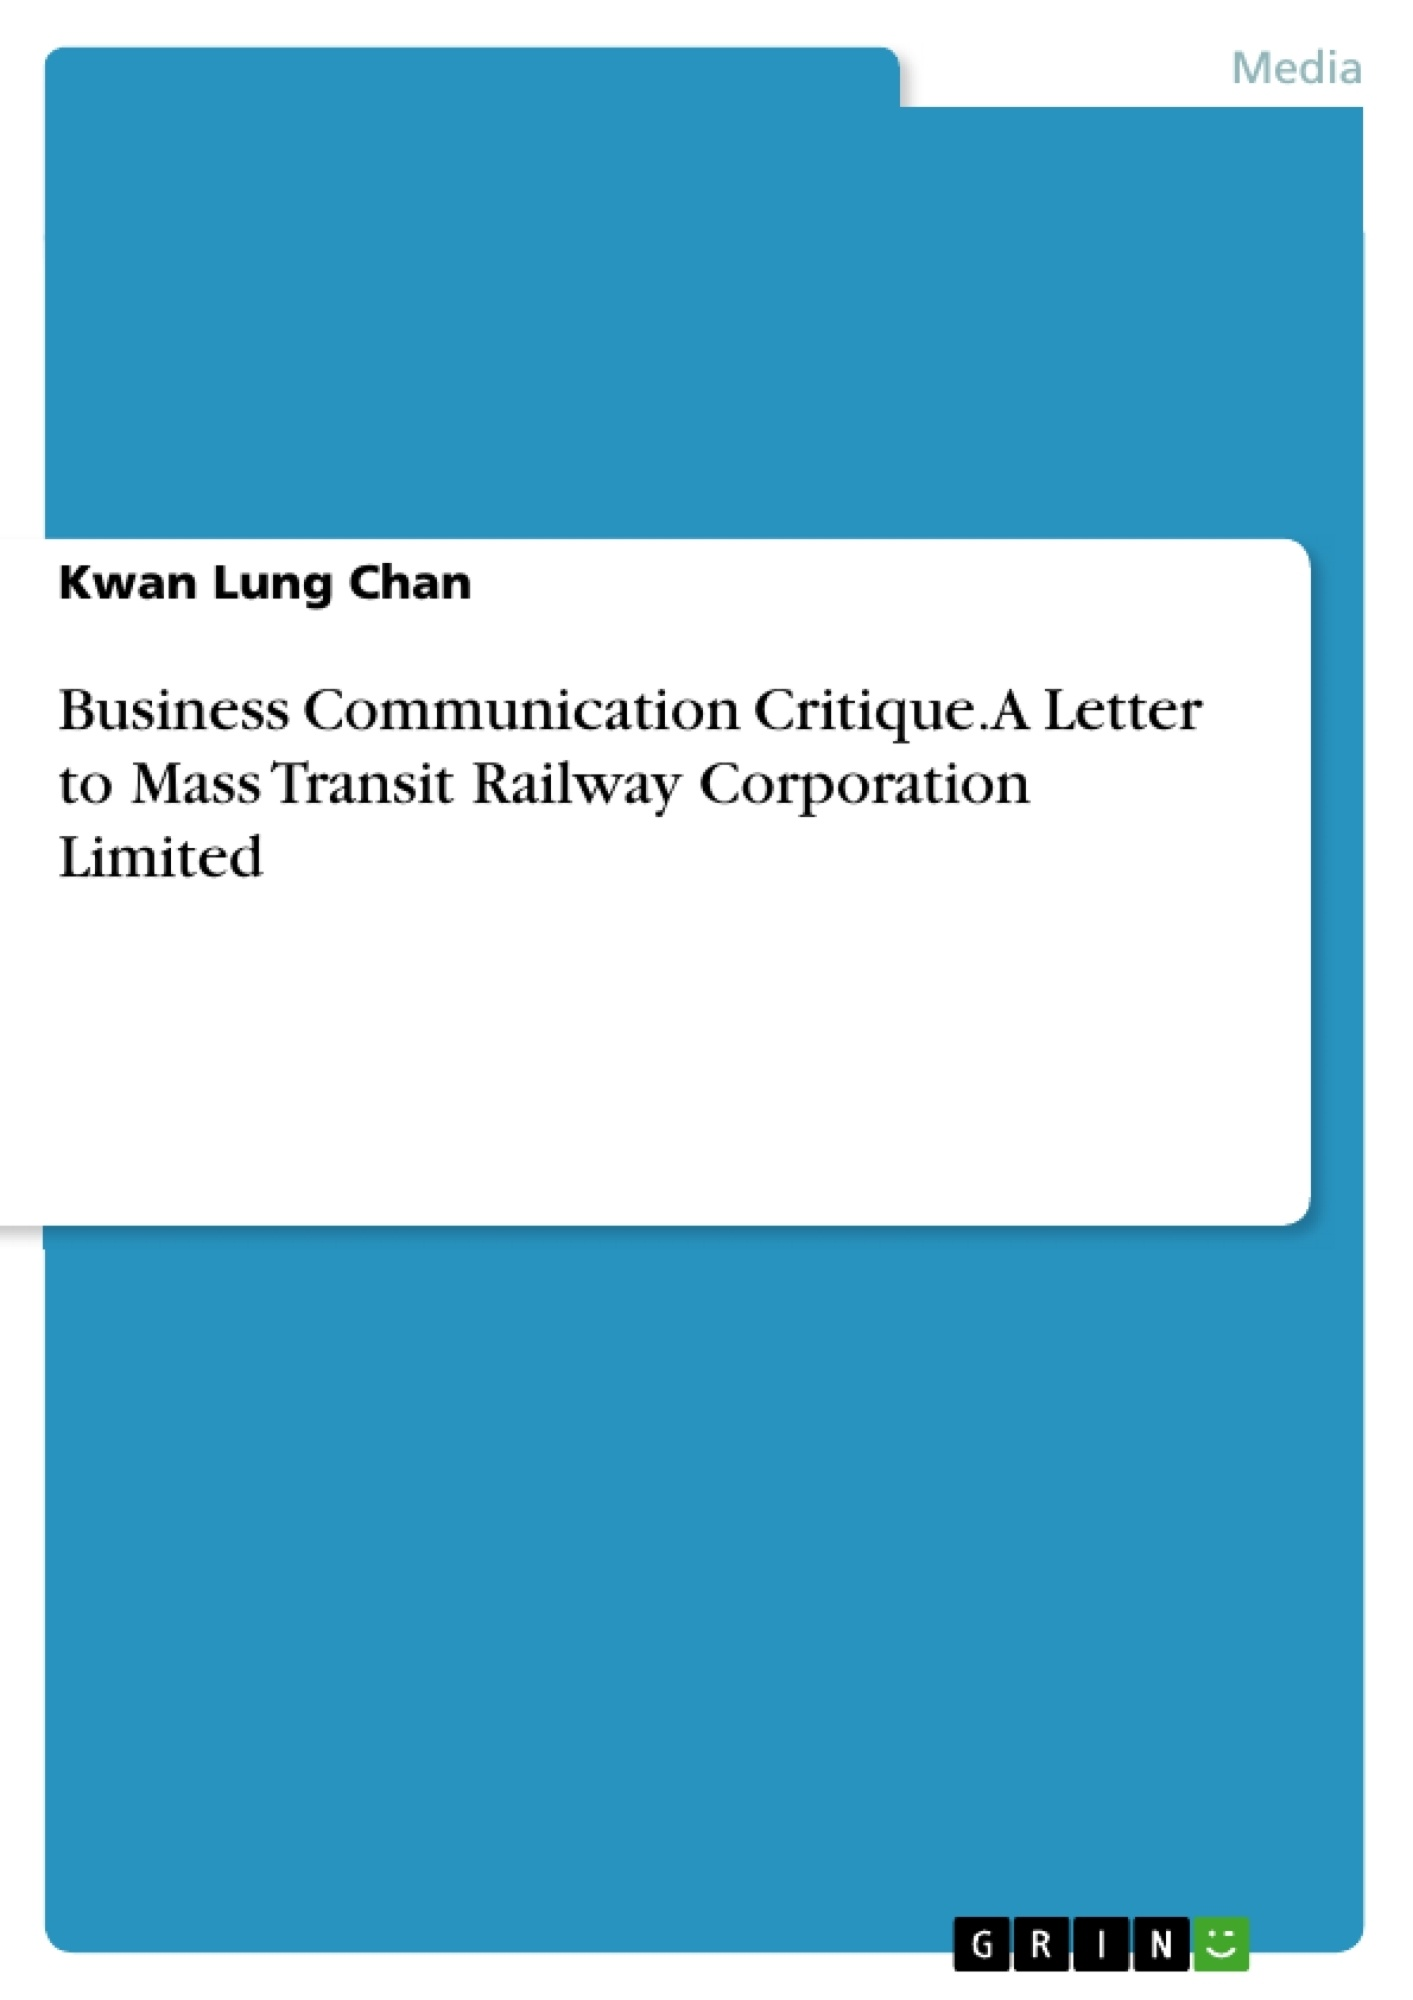 Title: Business Communication Critique.  A Letter to Mass Transit Railway Corporation Limited